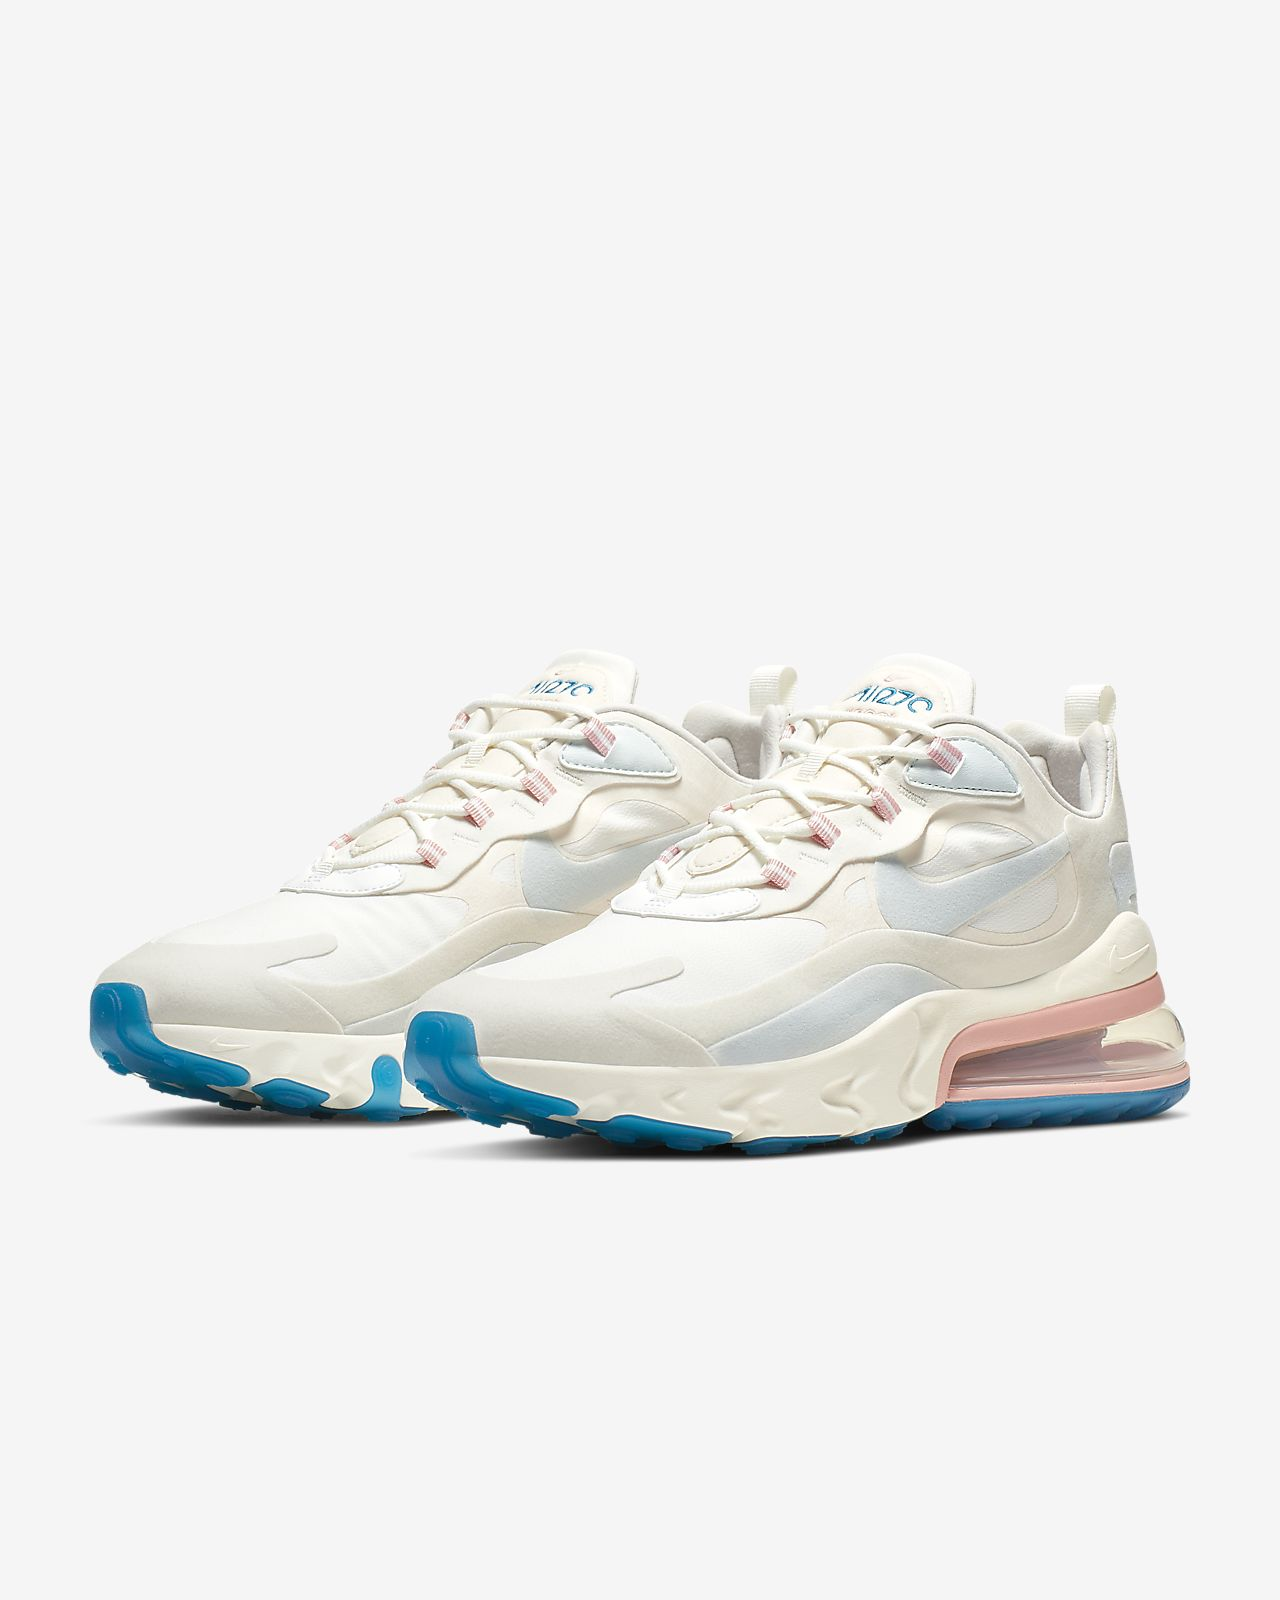 Nike Air Max 270 React Bauhaus Sneaker Hook Up Summer Love White Hoodie